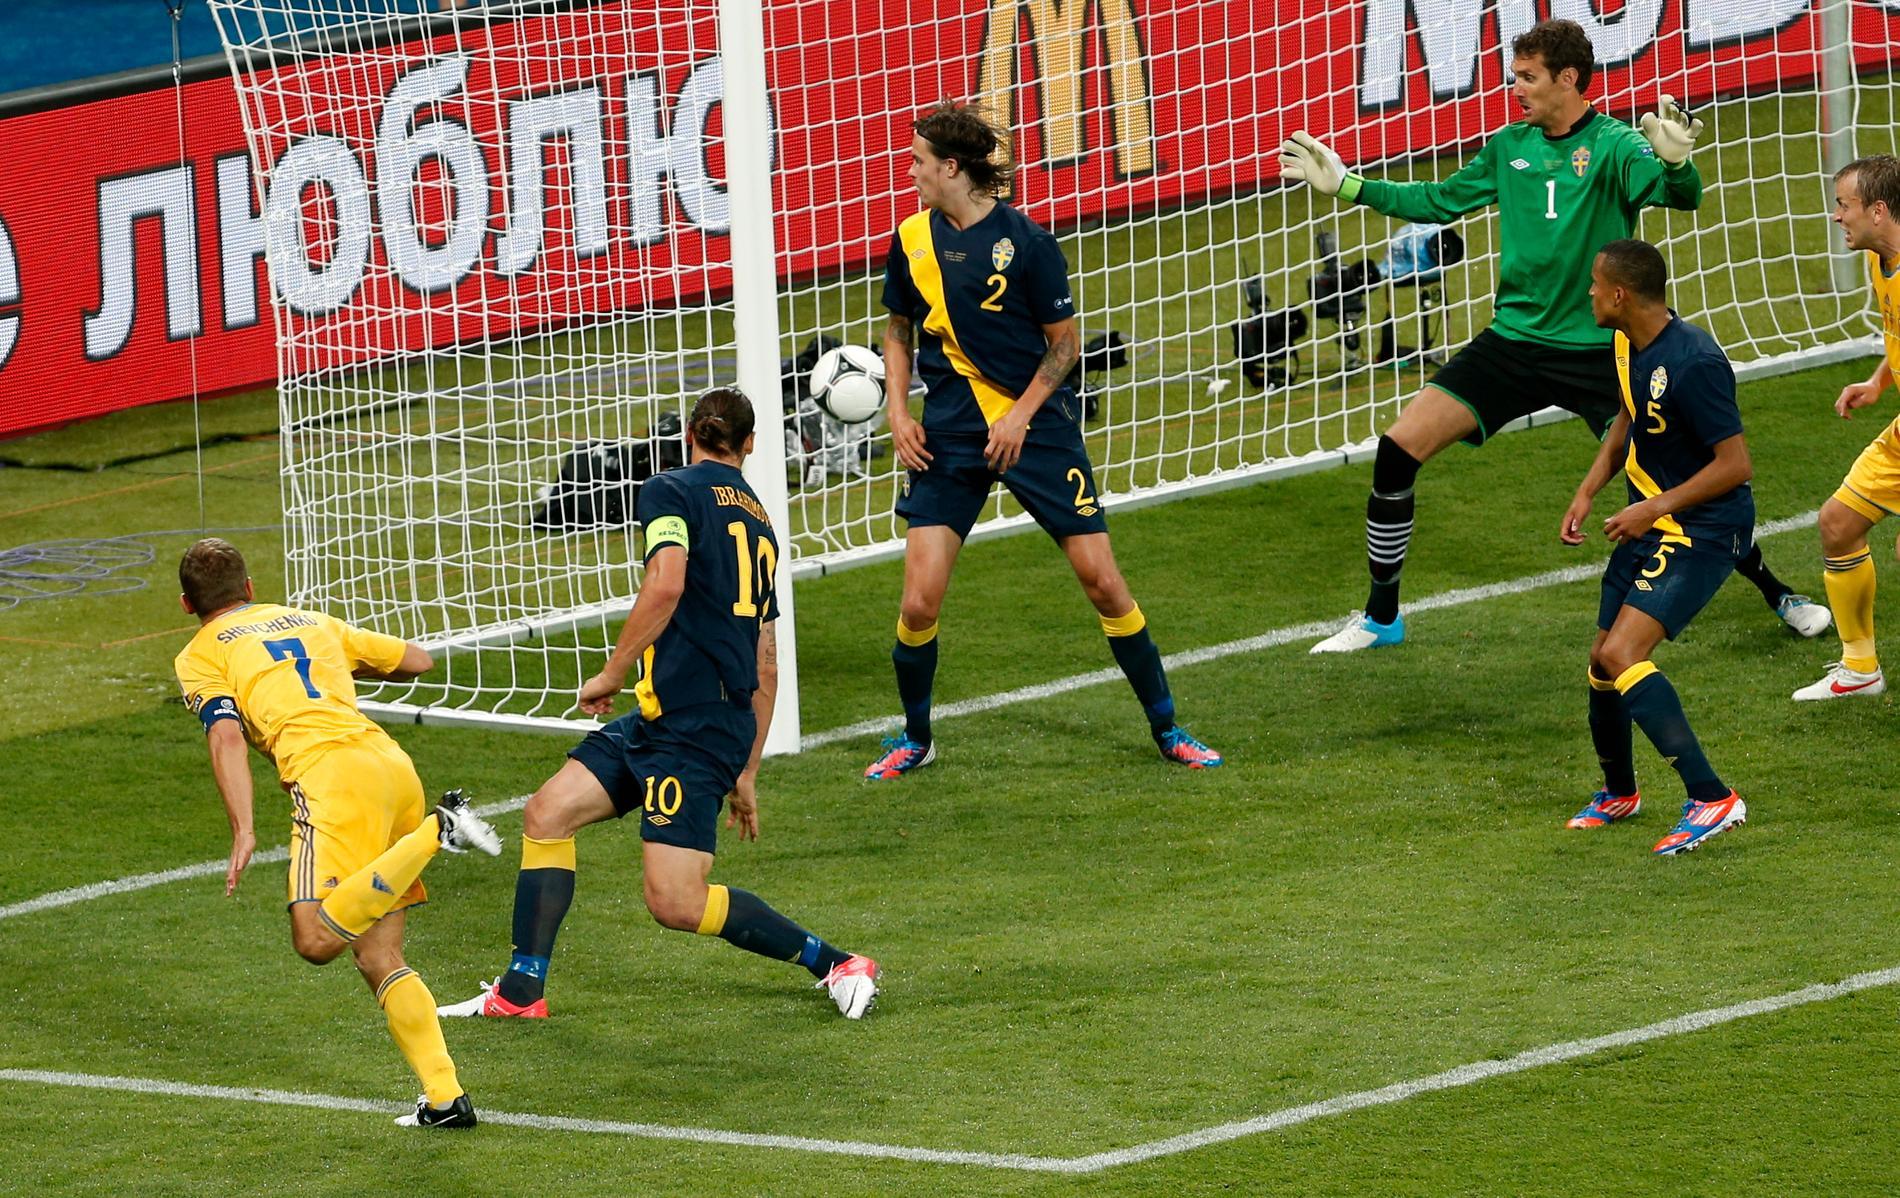 Senast Sverige mötte Ukraina i EM.